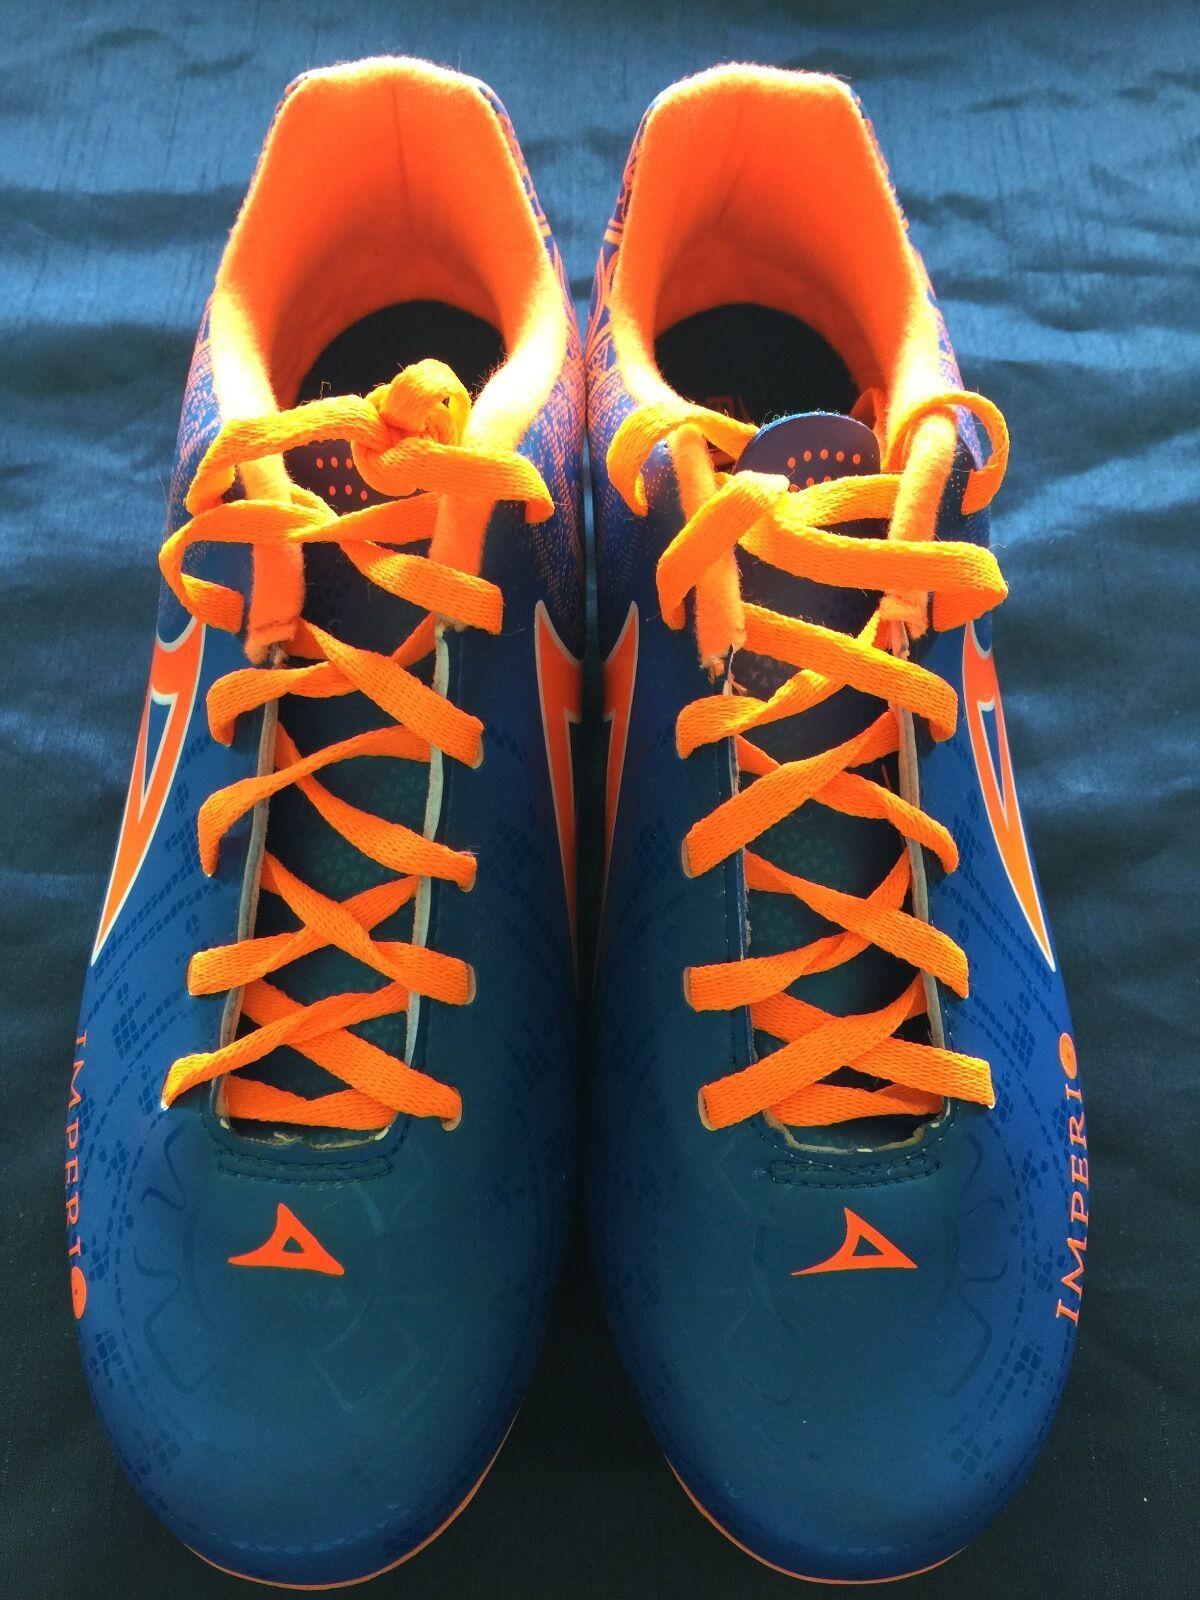 nuovo, PIRMA Imperio Light, cleats-Style 550-blu, Futbol, Footbtutti,Dimensione 6.5